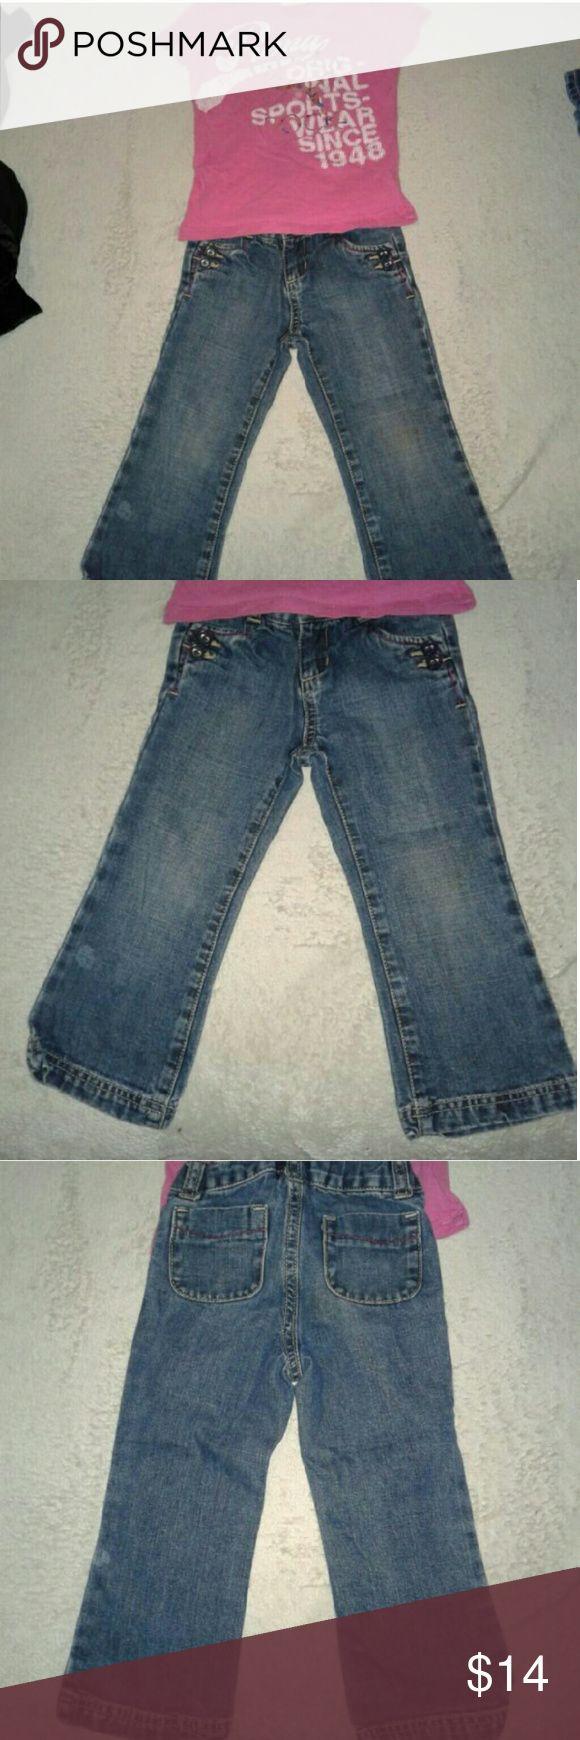 Puma Shirt, Old Navy Jeans Girls 3T Bundle Girls Old Navy Jeans and Puma Girls Shirt....Size 3T... Puma/ Old Navy Matching Sets